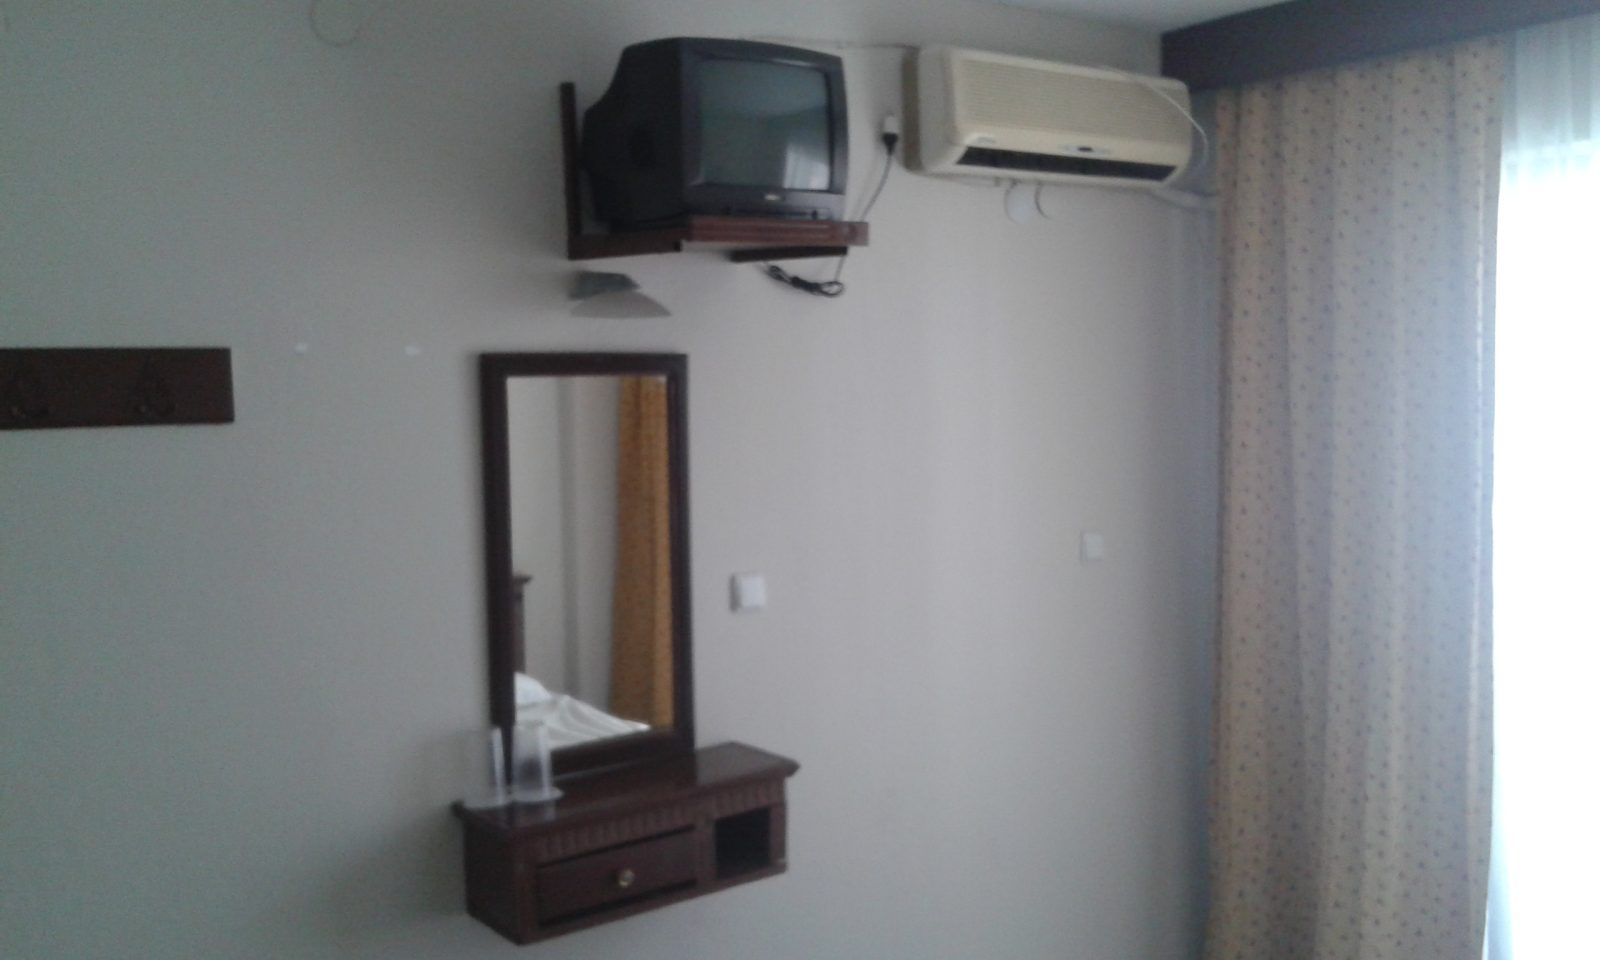 Letovanje Turska autobusom, Kusadasi, Hotel Tecimen,klima i TV u sobi